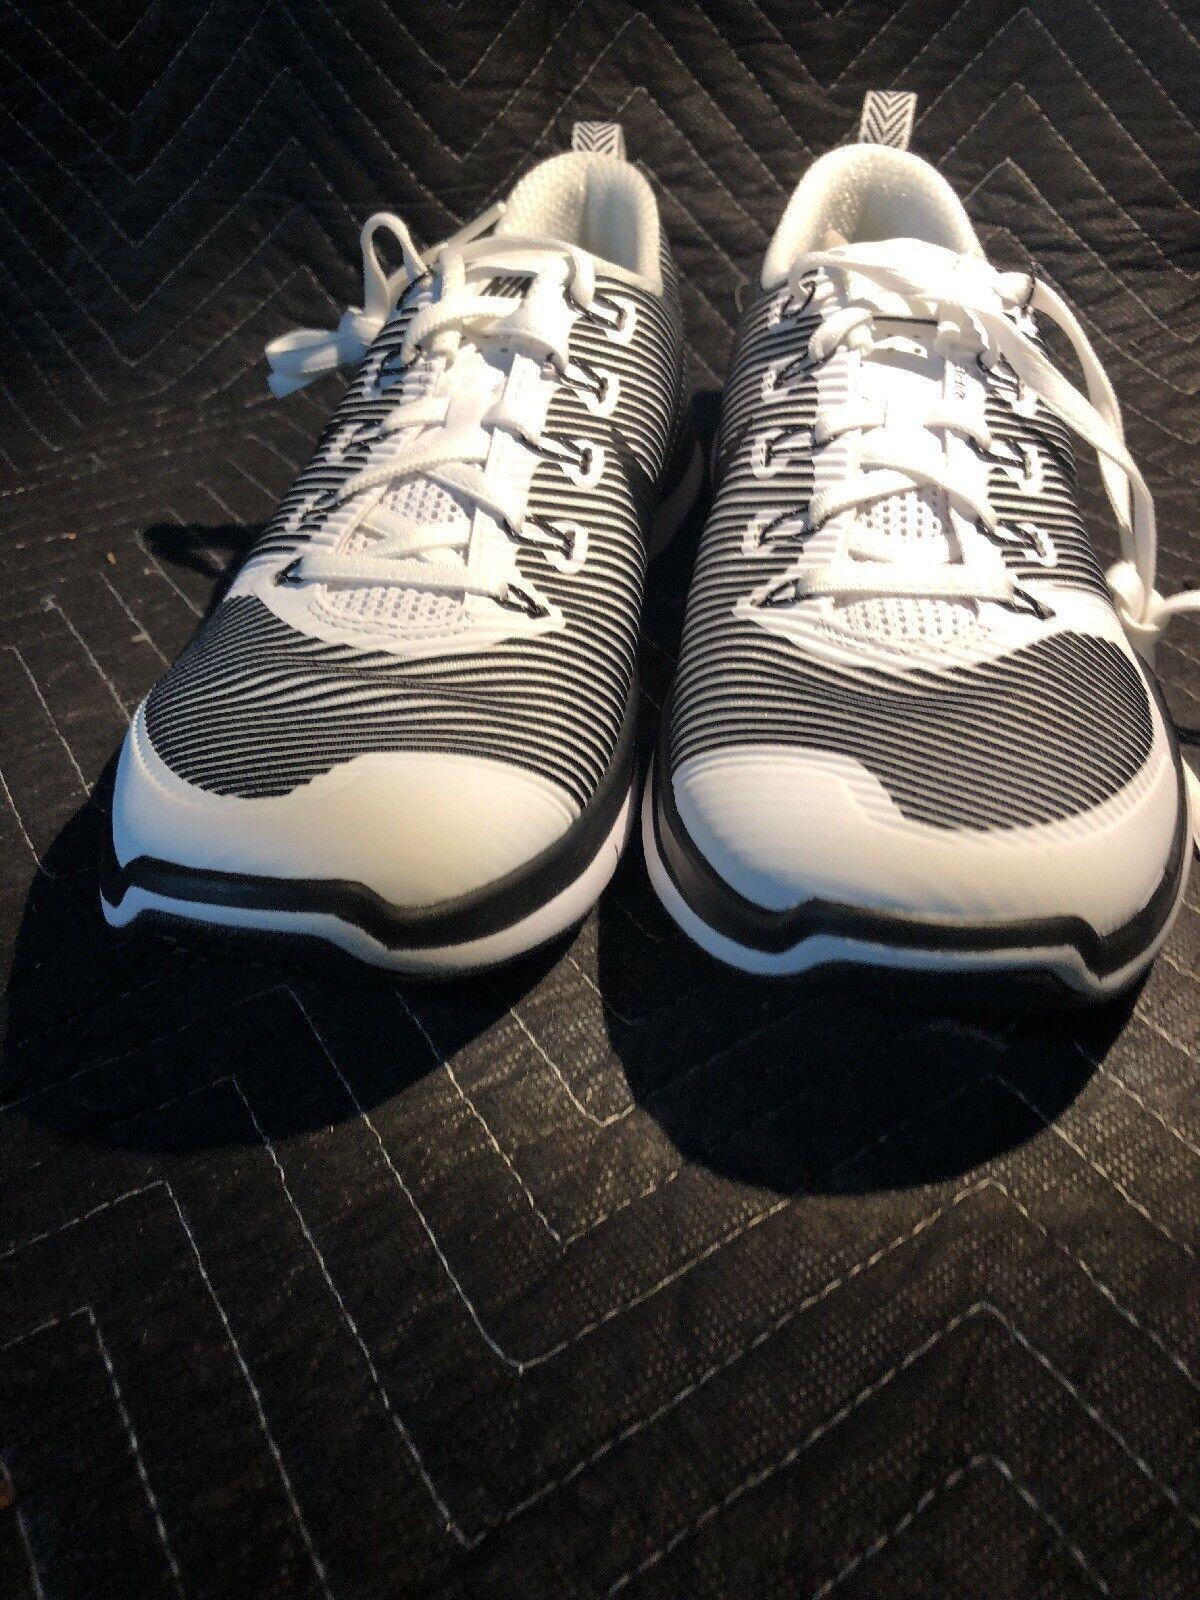 Nike Free Train Versatility White Black Mens Size 12